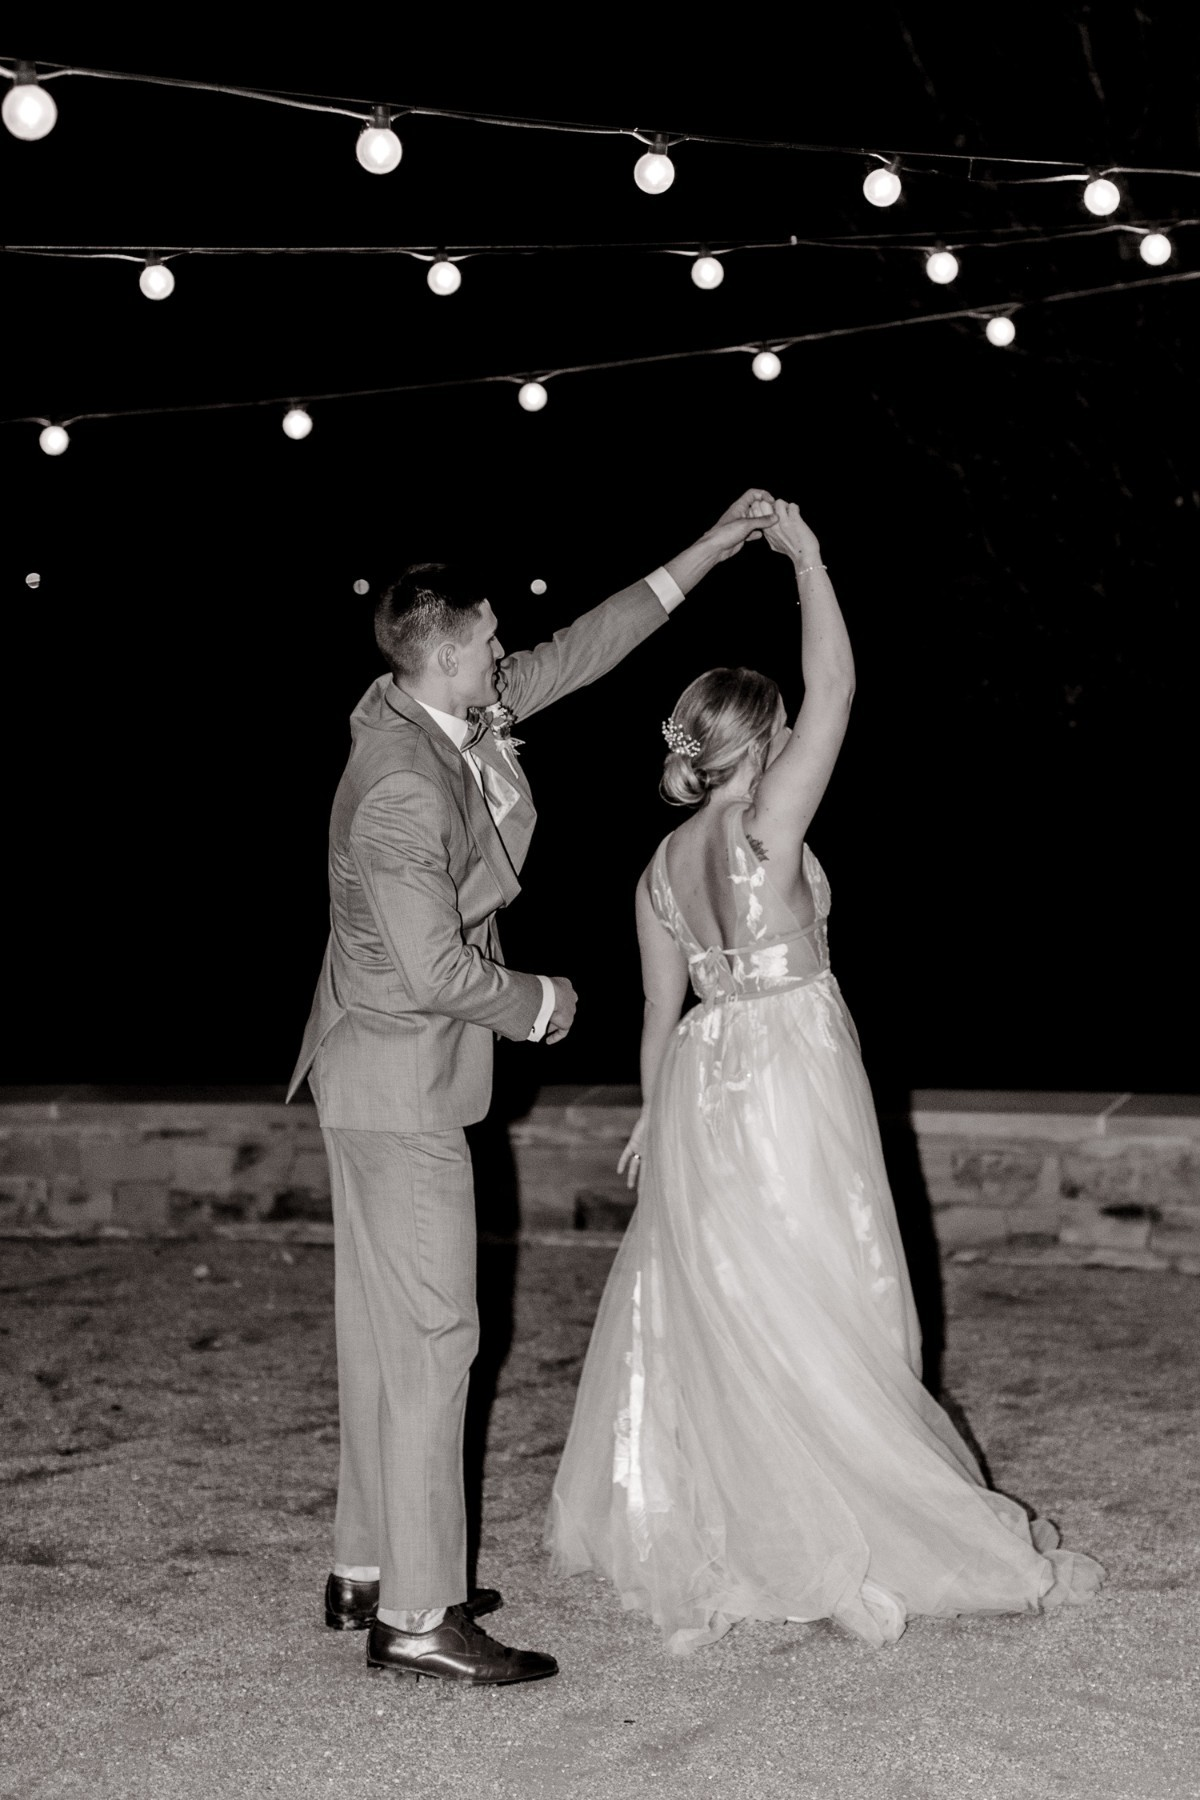 ennis-texas-wedding-photographer-kaitlyn-bullard-128.jpg